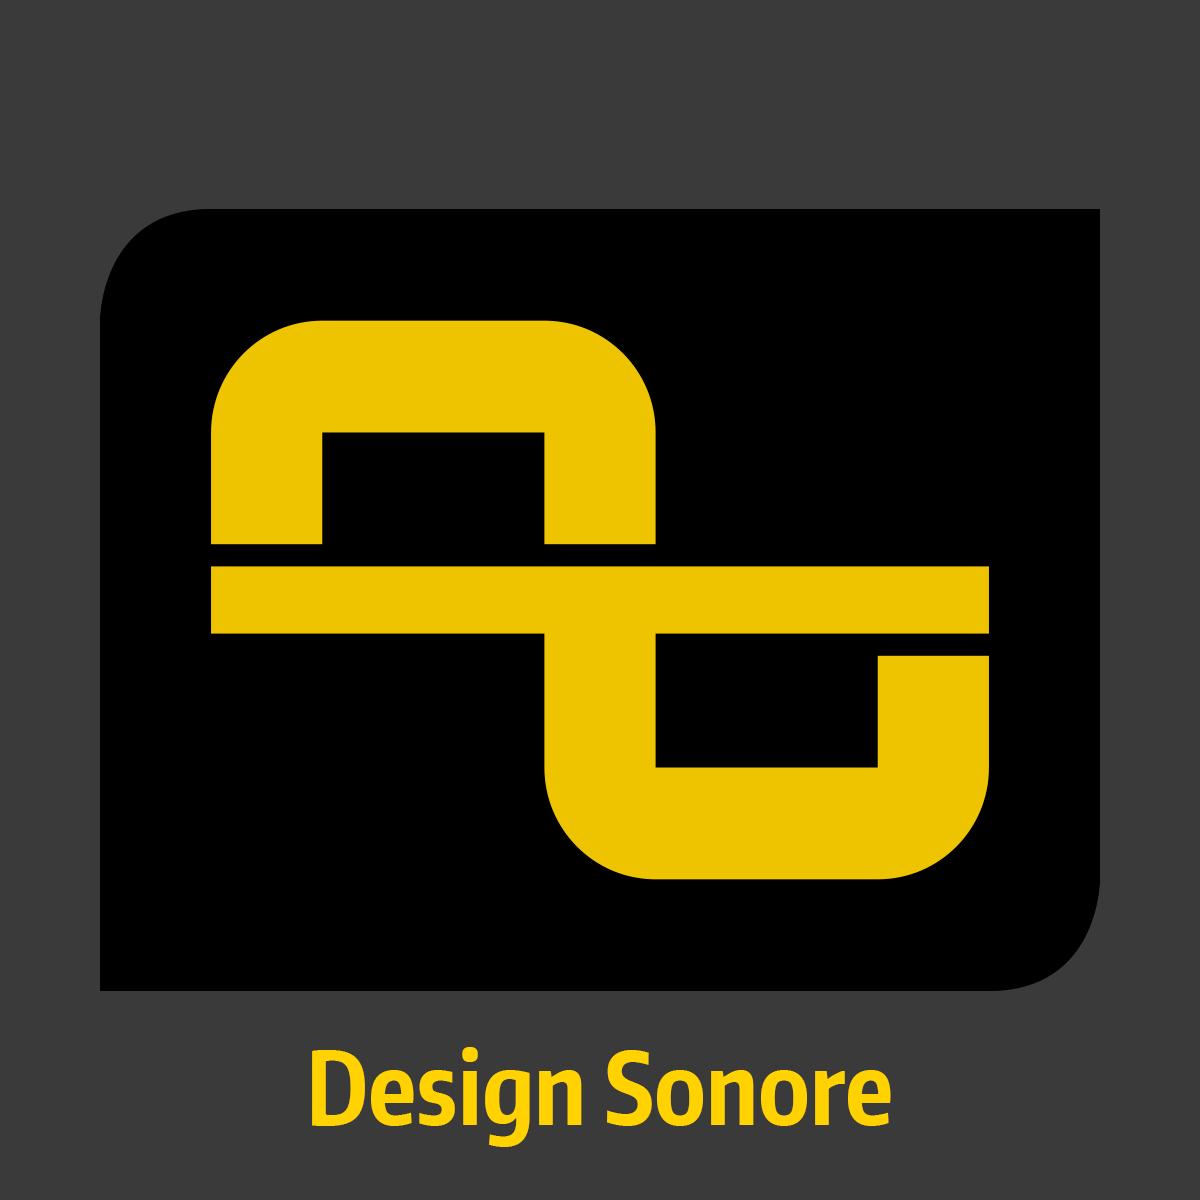 Formation à la carte - Design Sonore